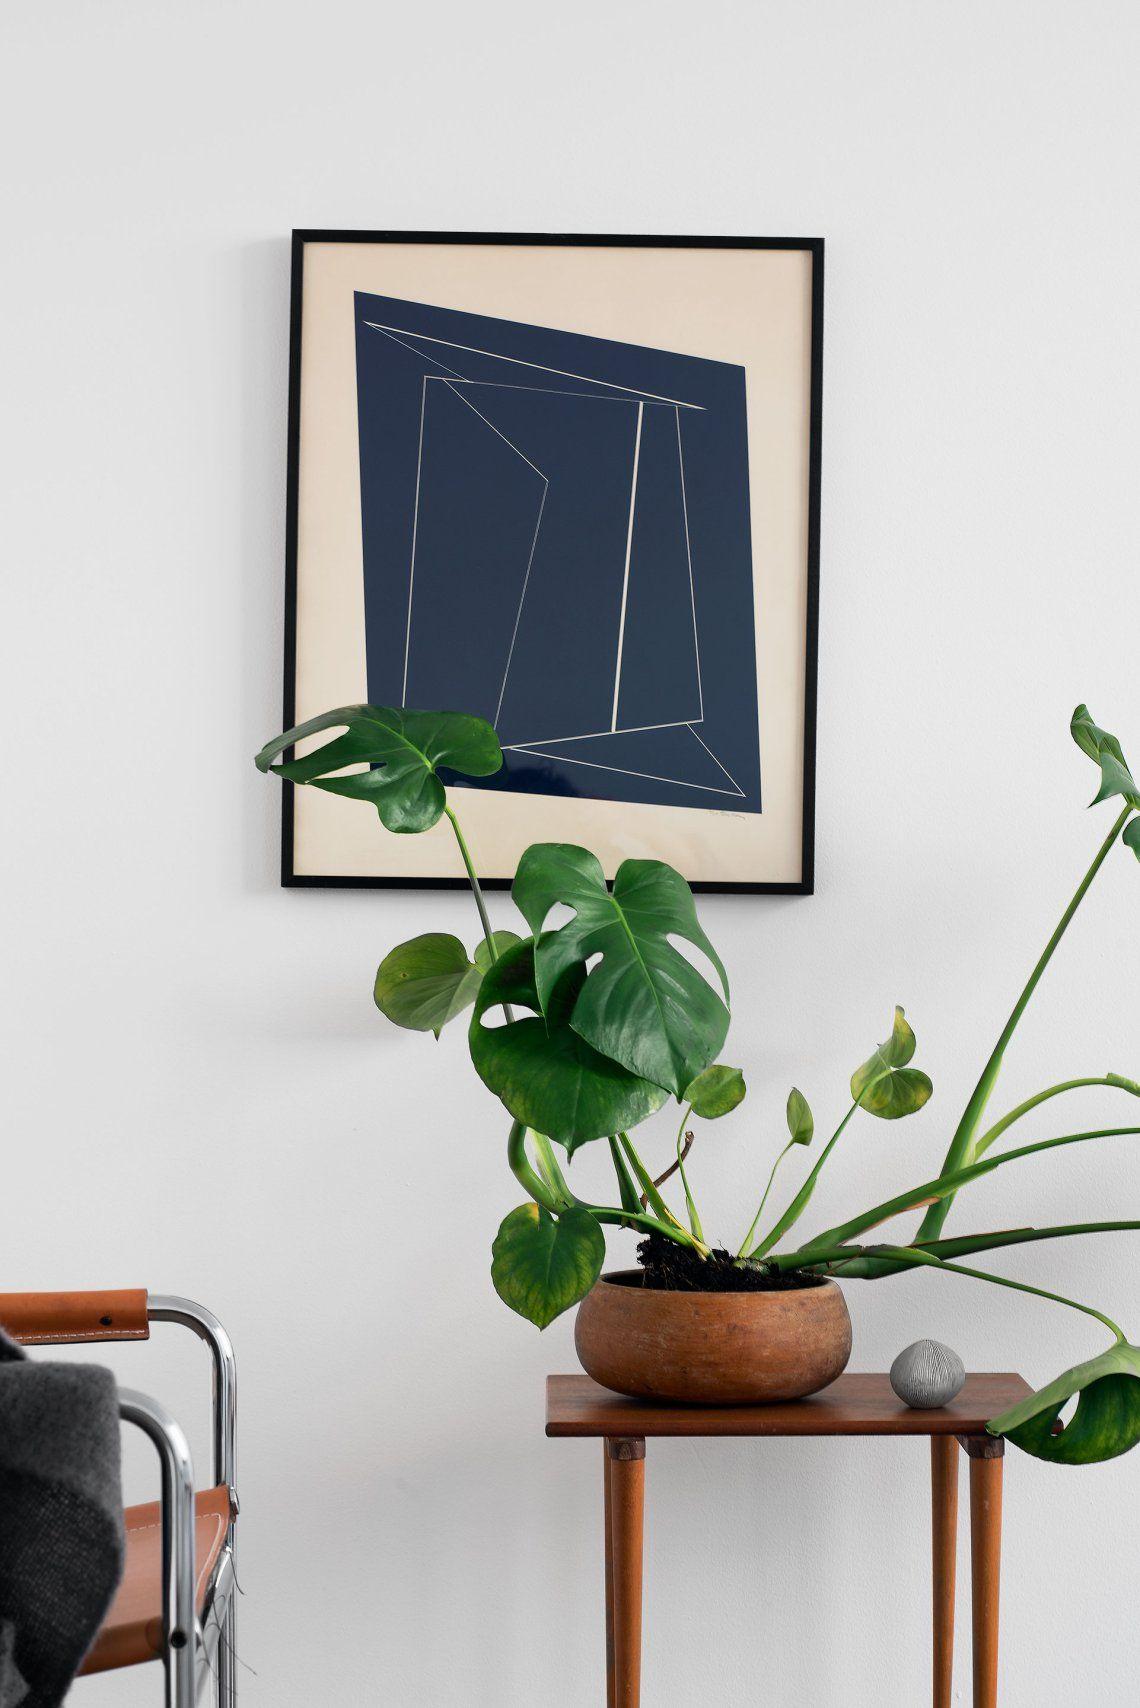 Minimal home staging nice plant in teak pot bowl on danish